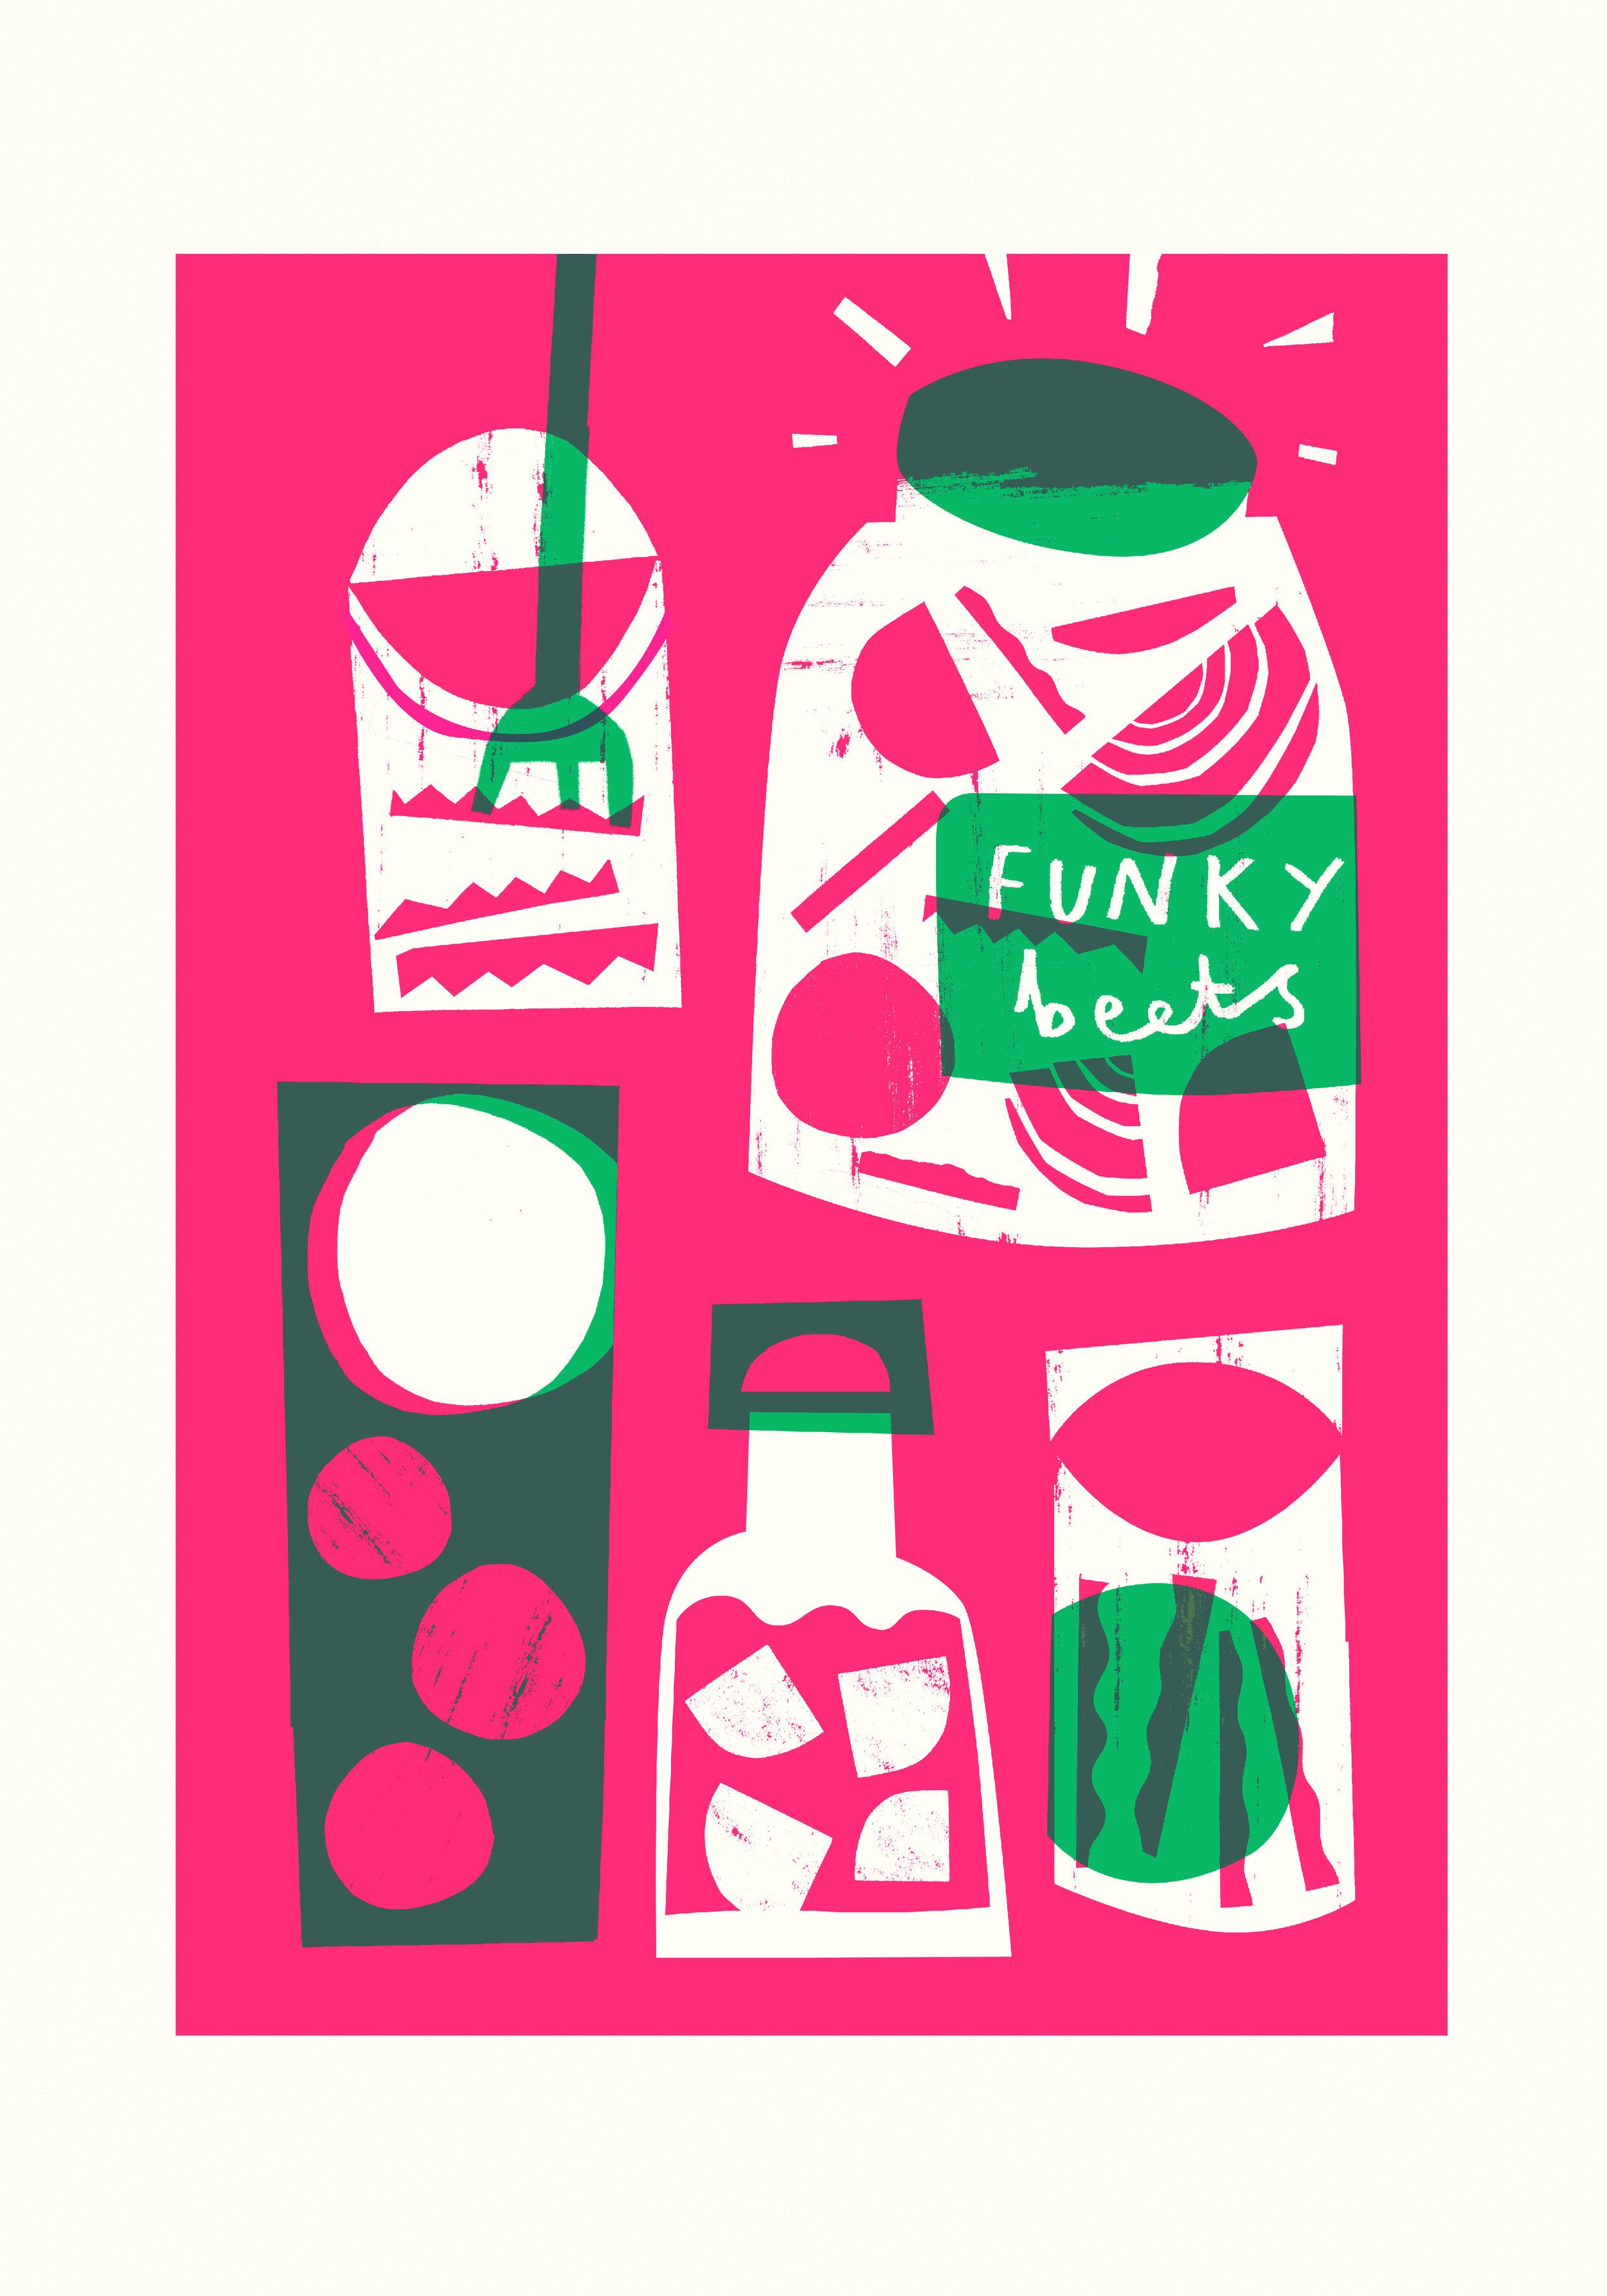 3. LucyHowarth-ArtWork3-FUNKYBEETS.jpg